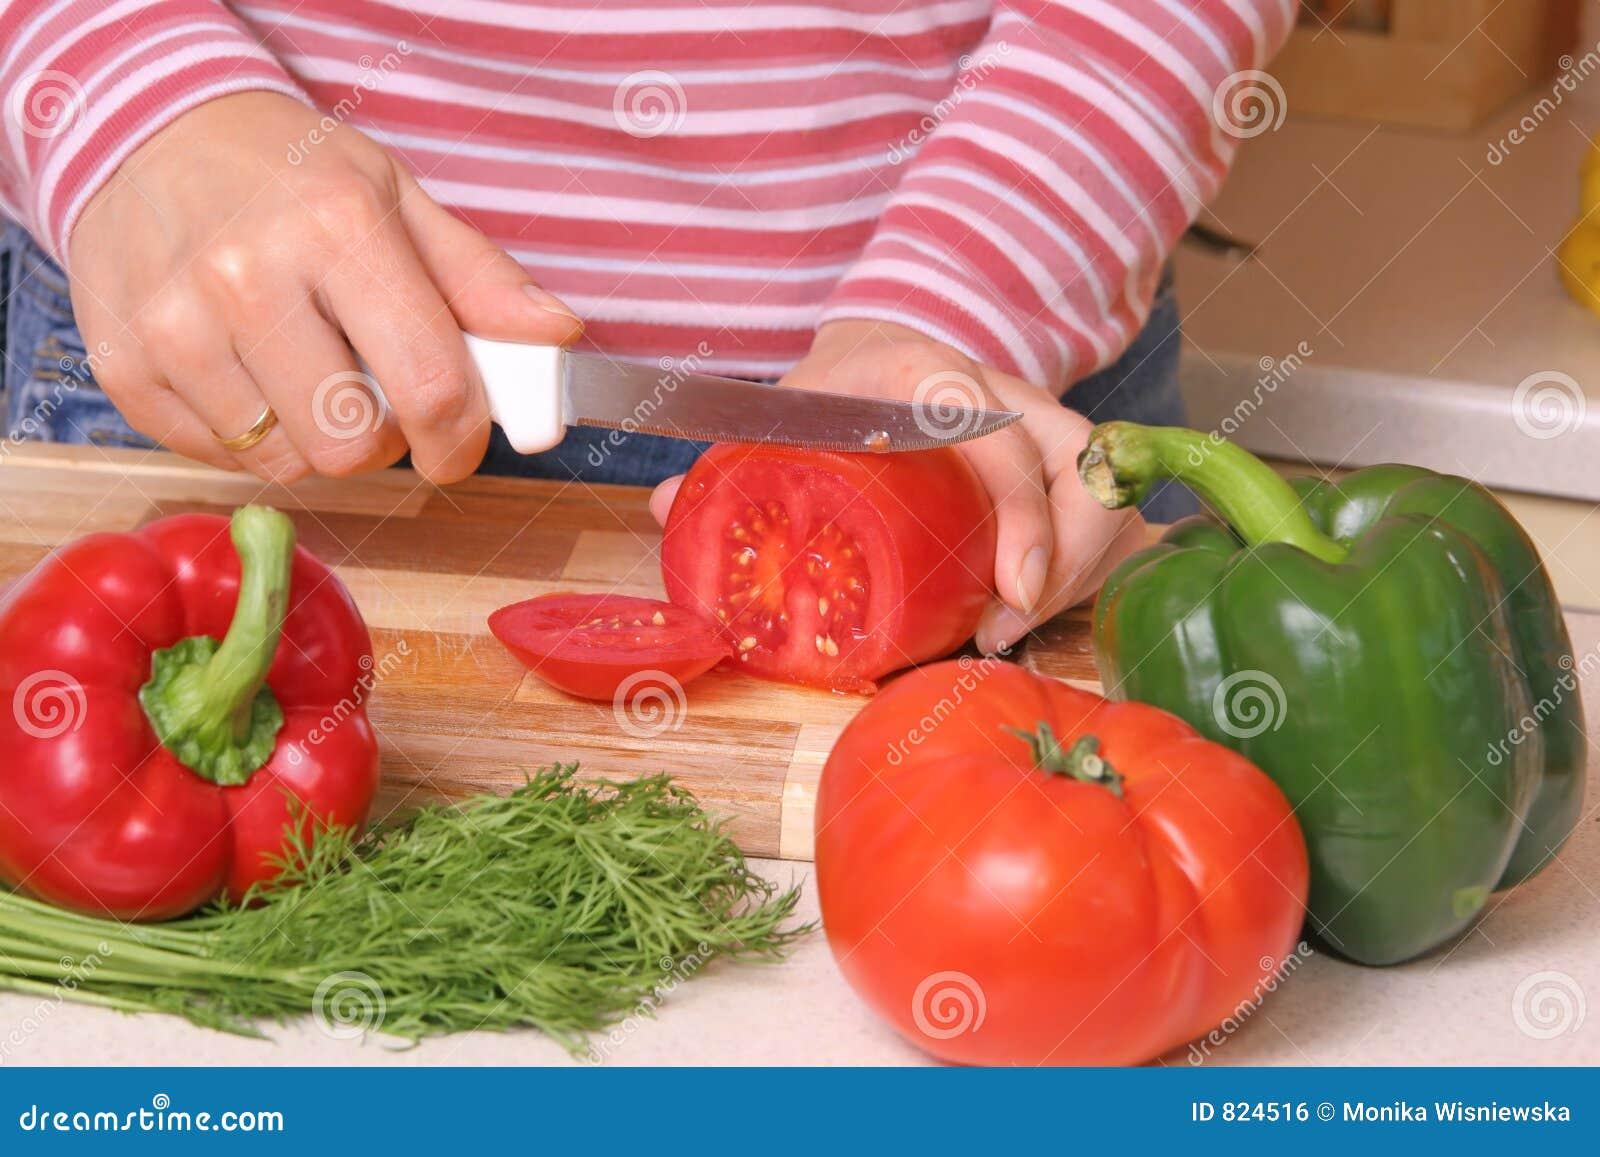 Preparing Food Royalty Free Stock Image - Image: 824516